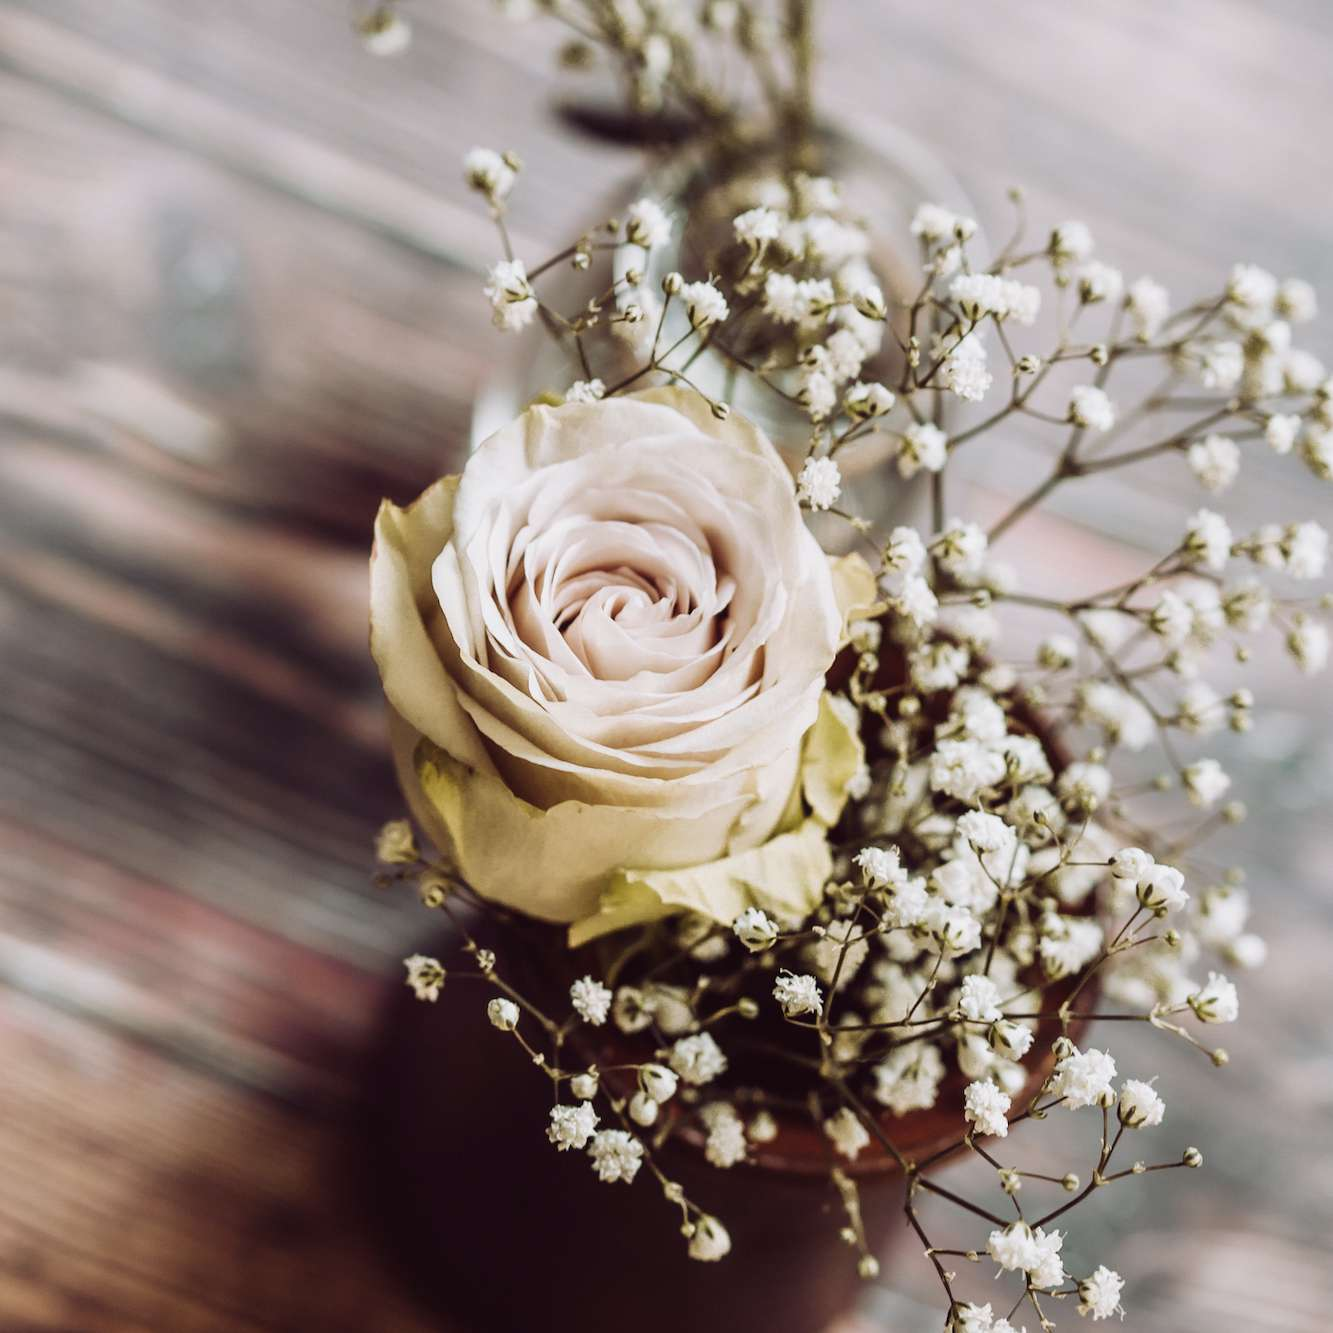 6 Ways To Preserve Your Wedding Flowers